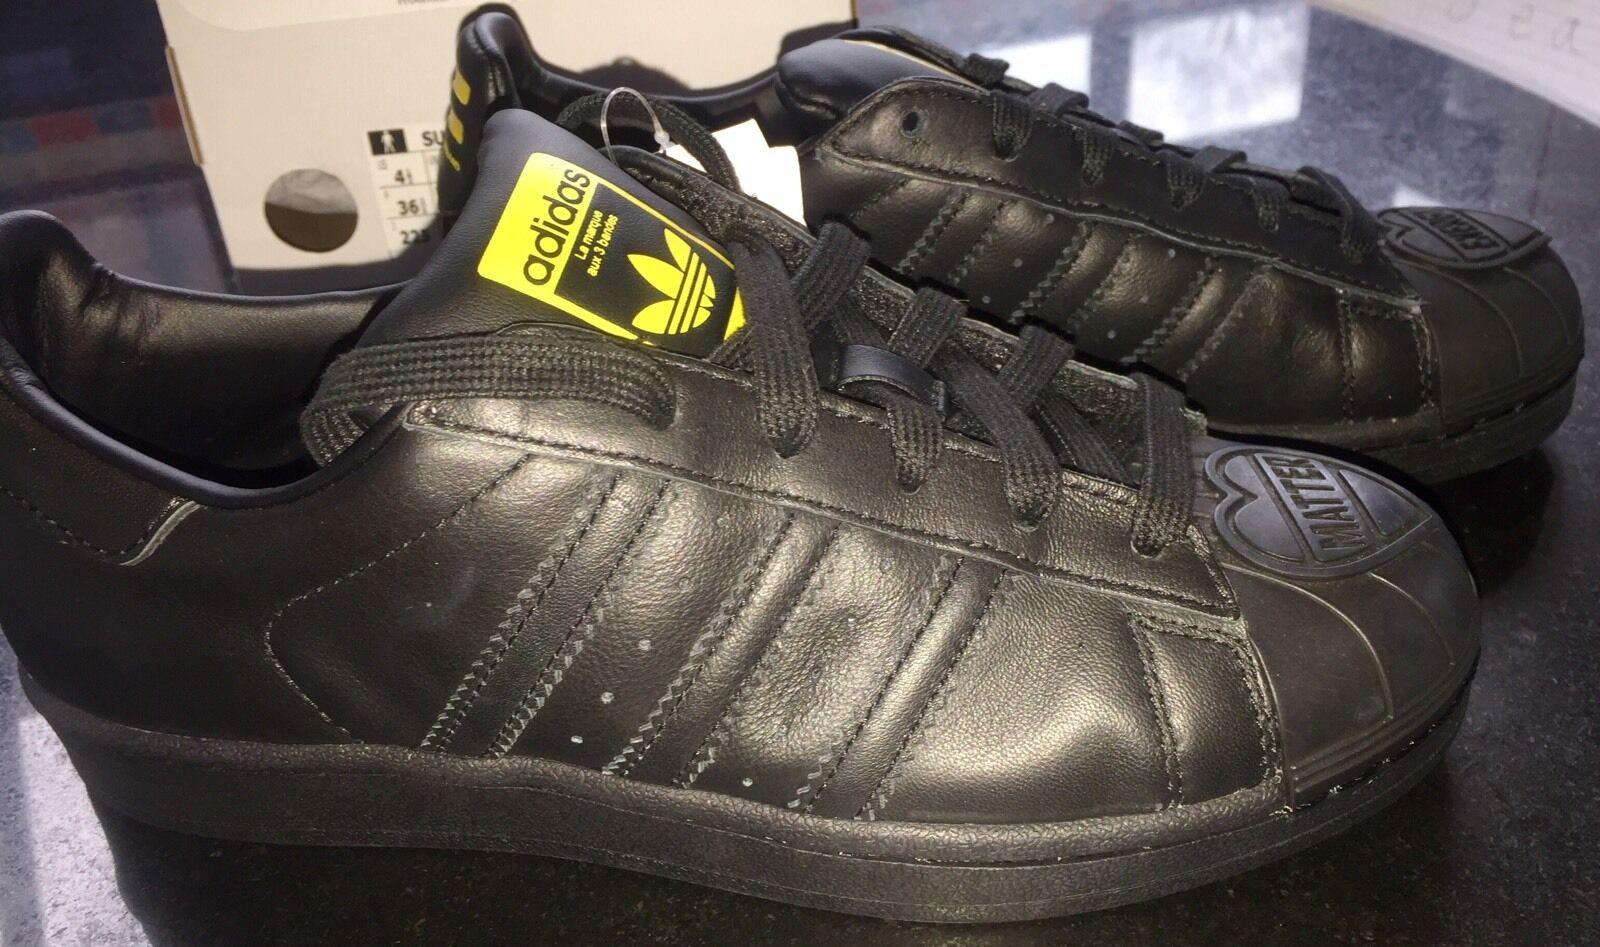 Adidas Superstar Pharrell Supersh Originals Blk Leder Trainers BN Boxed UK 3.5